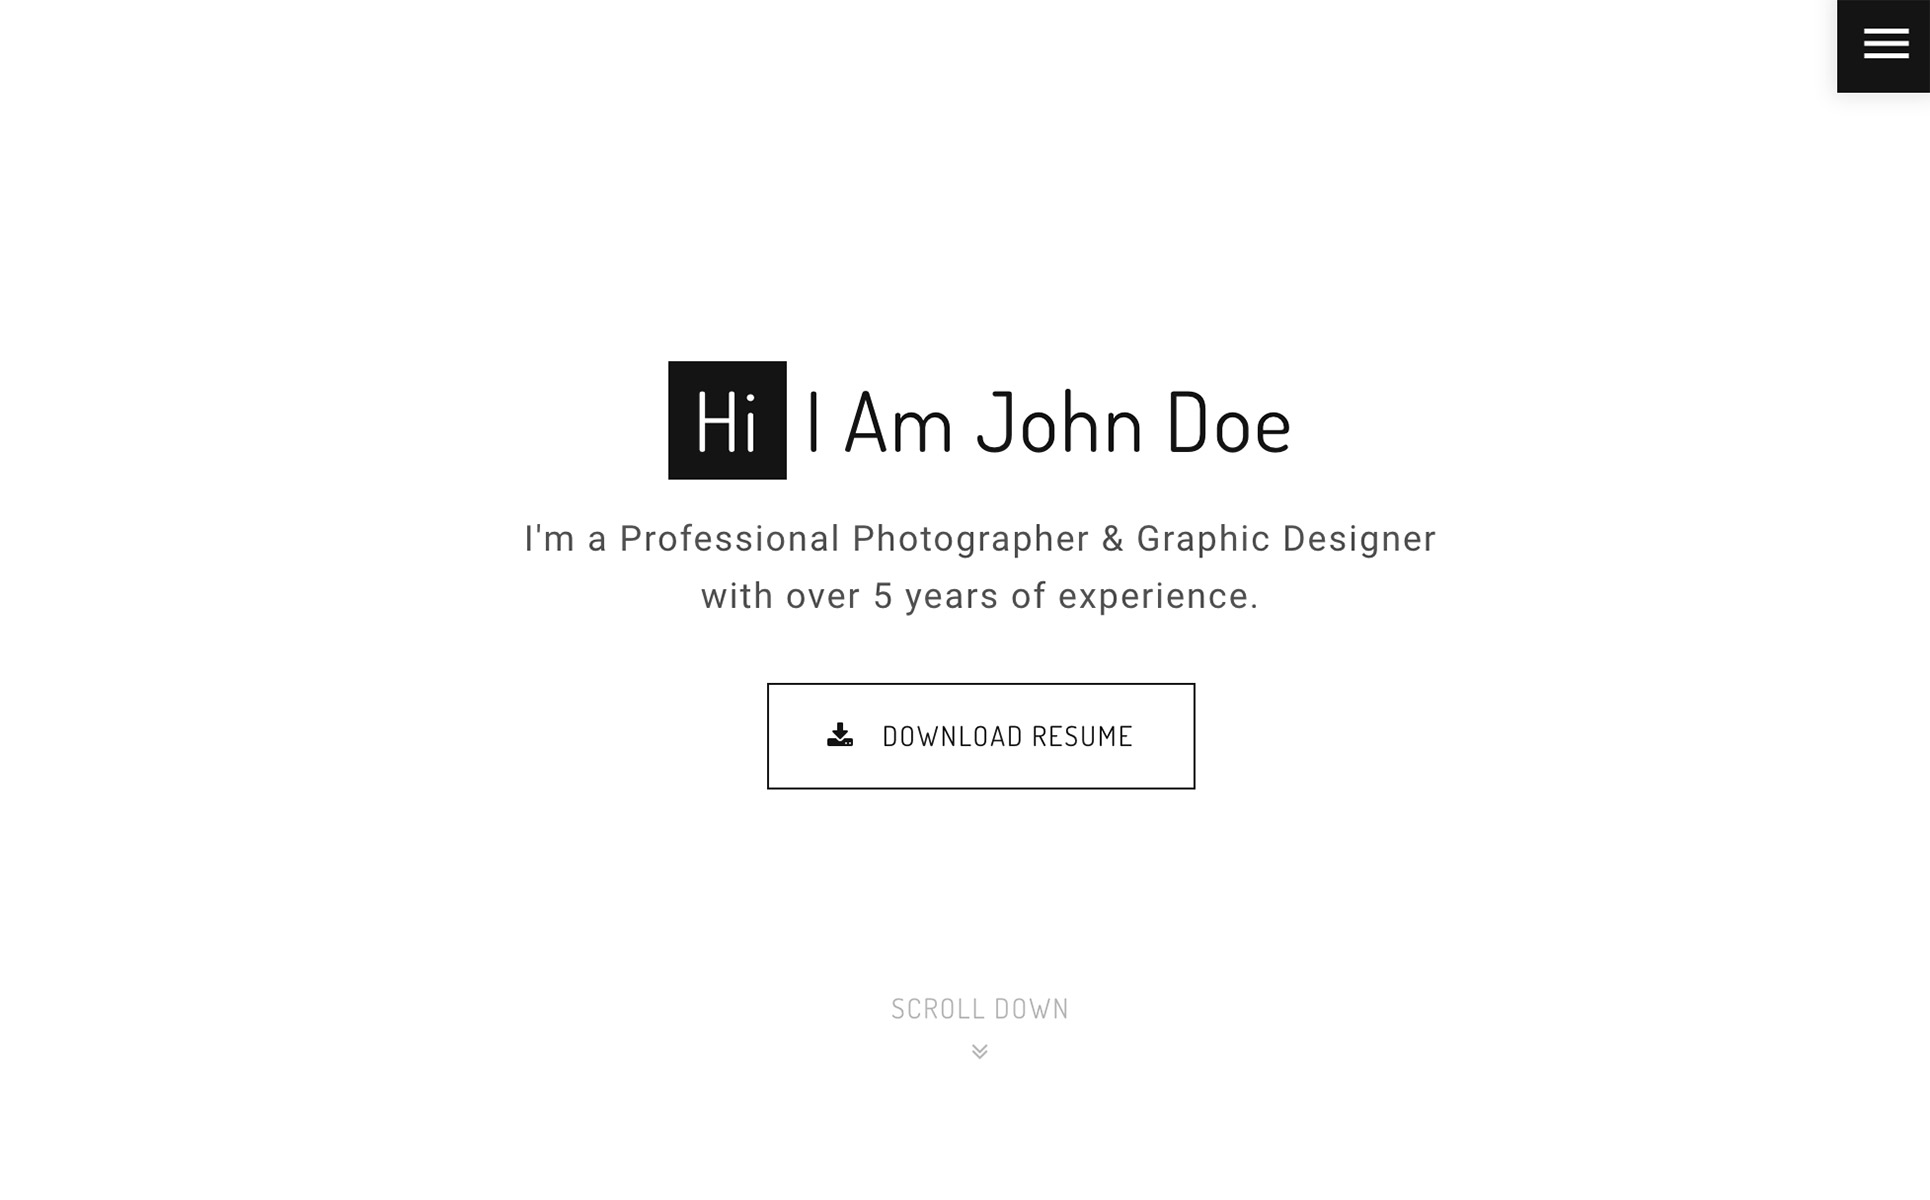 John Doe - Photography Landing Page Template